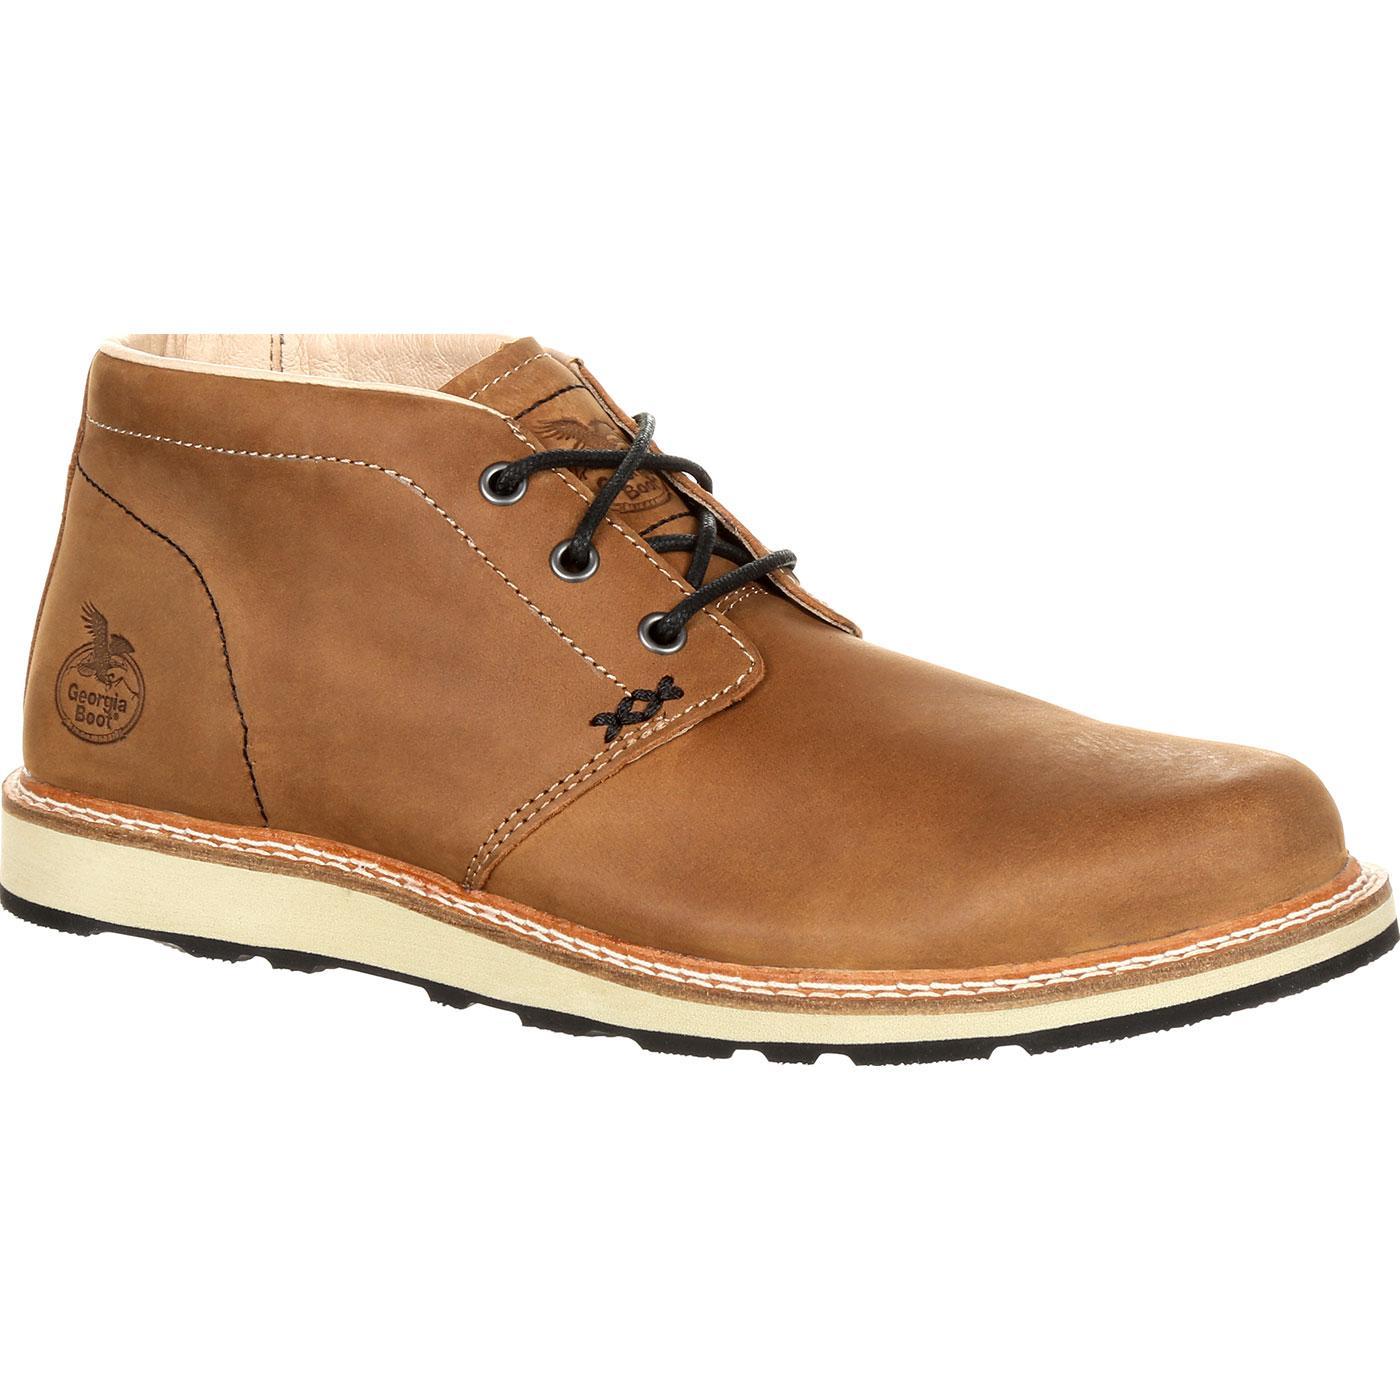 Georgia Boot Small Batch Chukka Brown Leather Boot